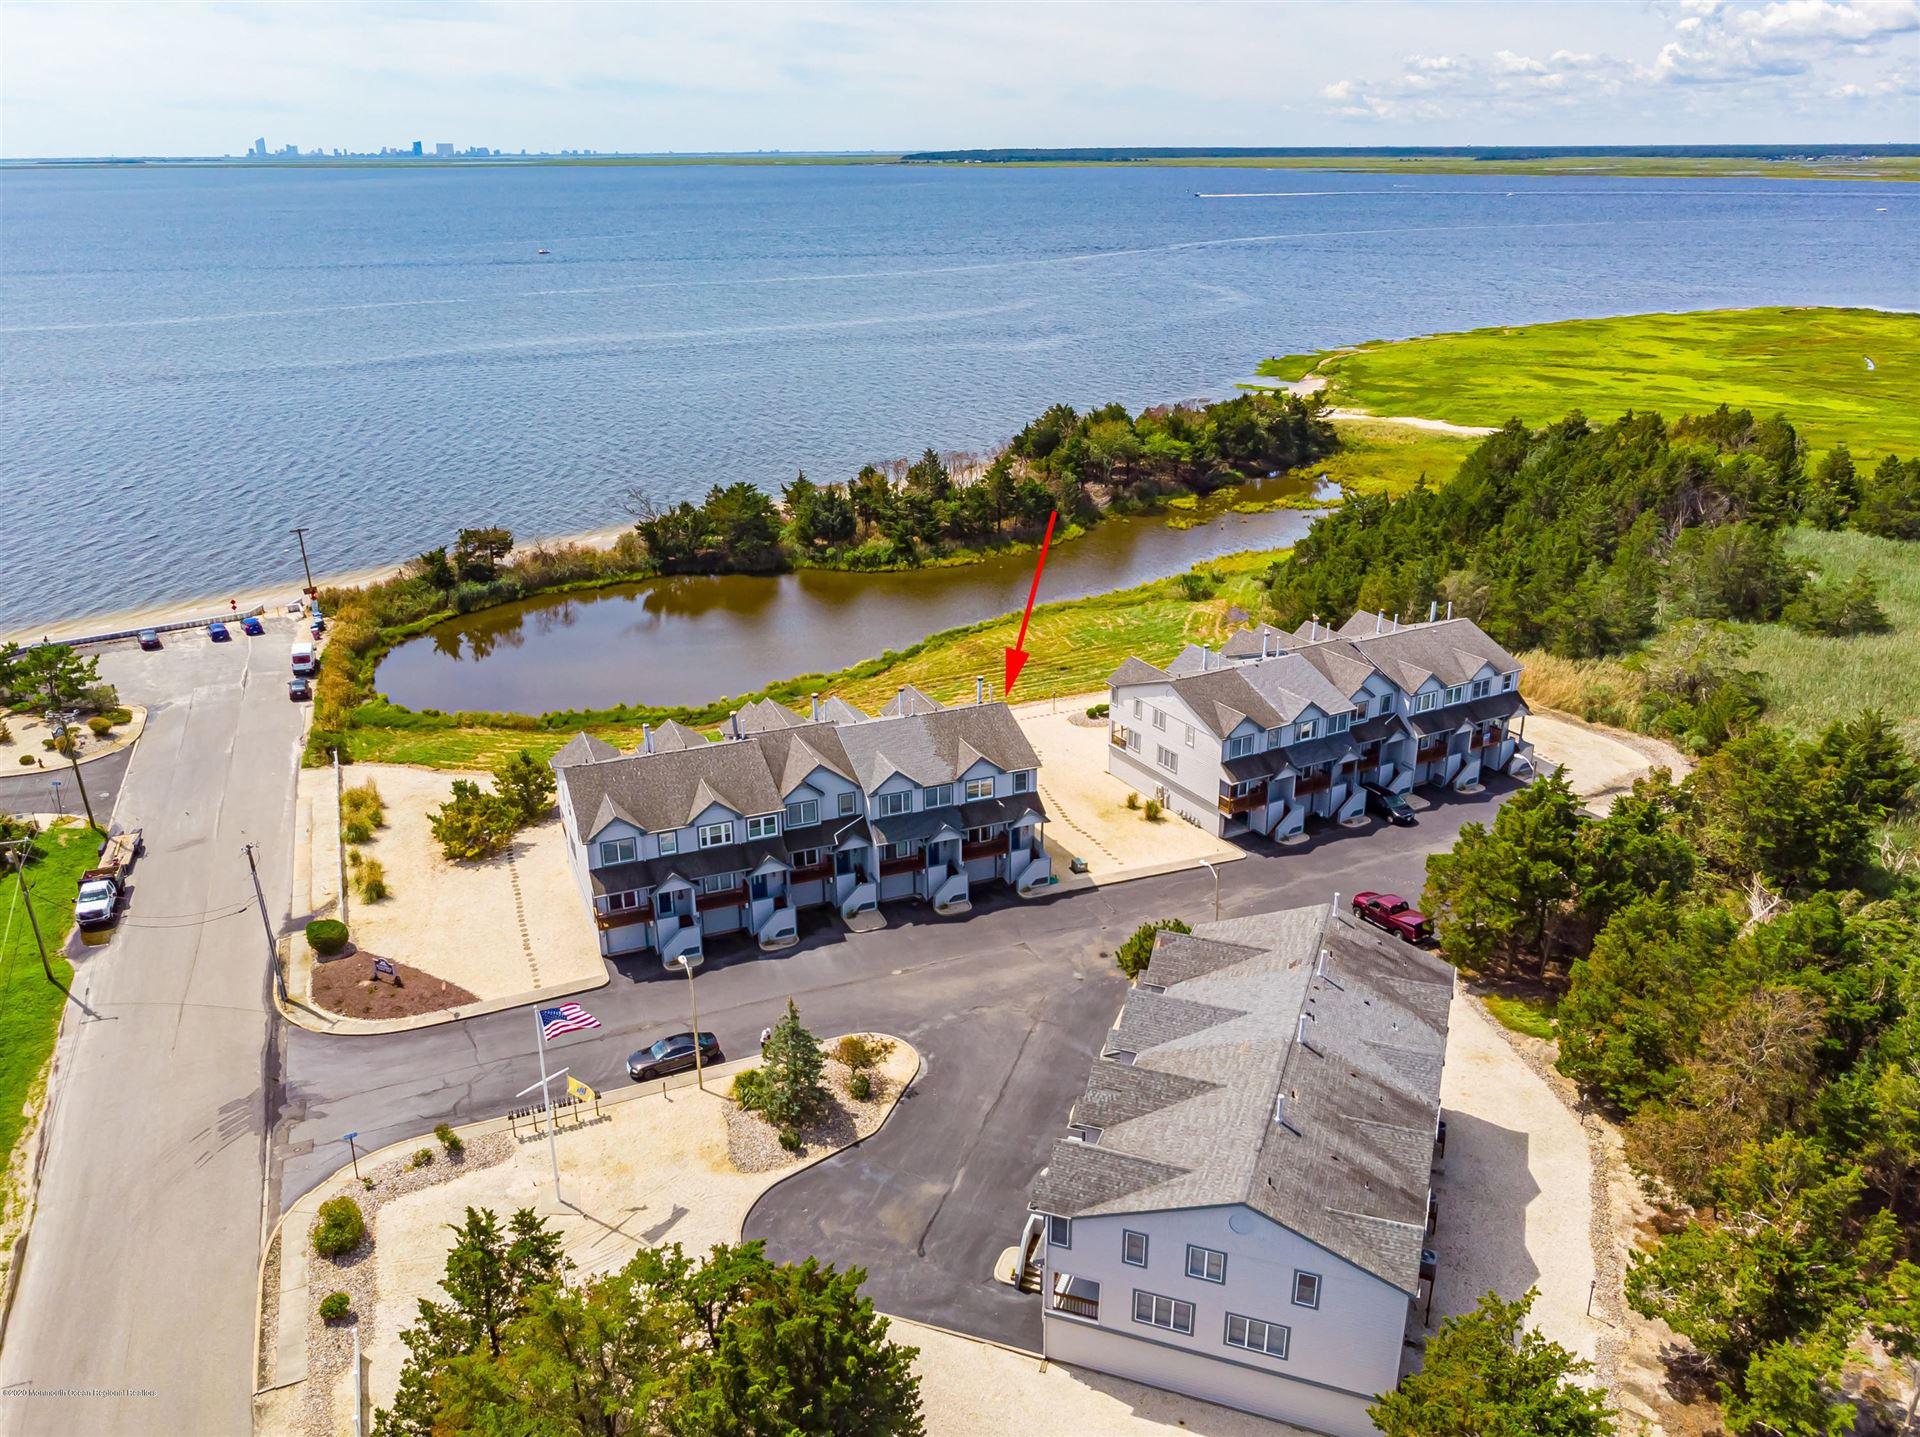 9 Mariners Pointe W, Little Egg Harbor, NJ 08087 - MLS#: 22029782